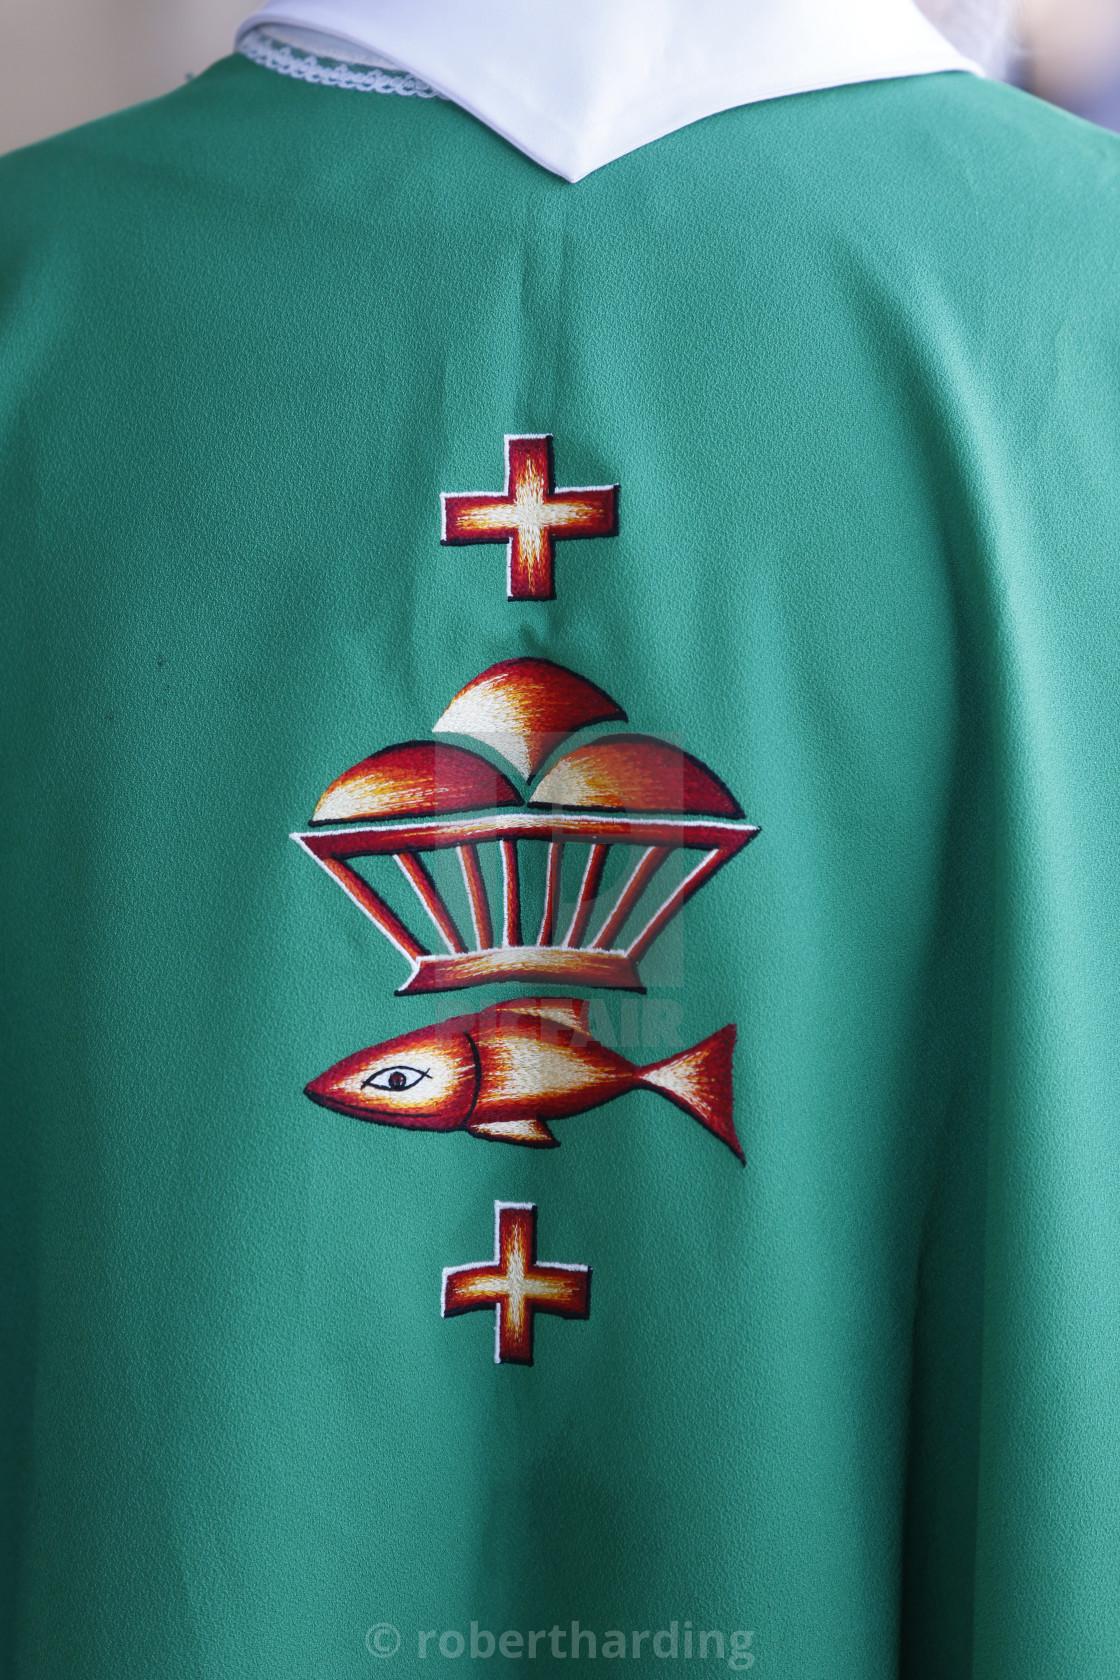 """Catholic priest's chasuble embroidery, Rancourt, Somme, France, Europe"" stock image"